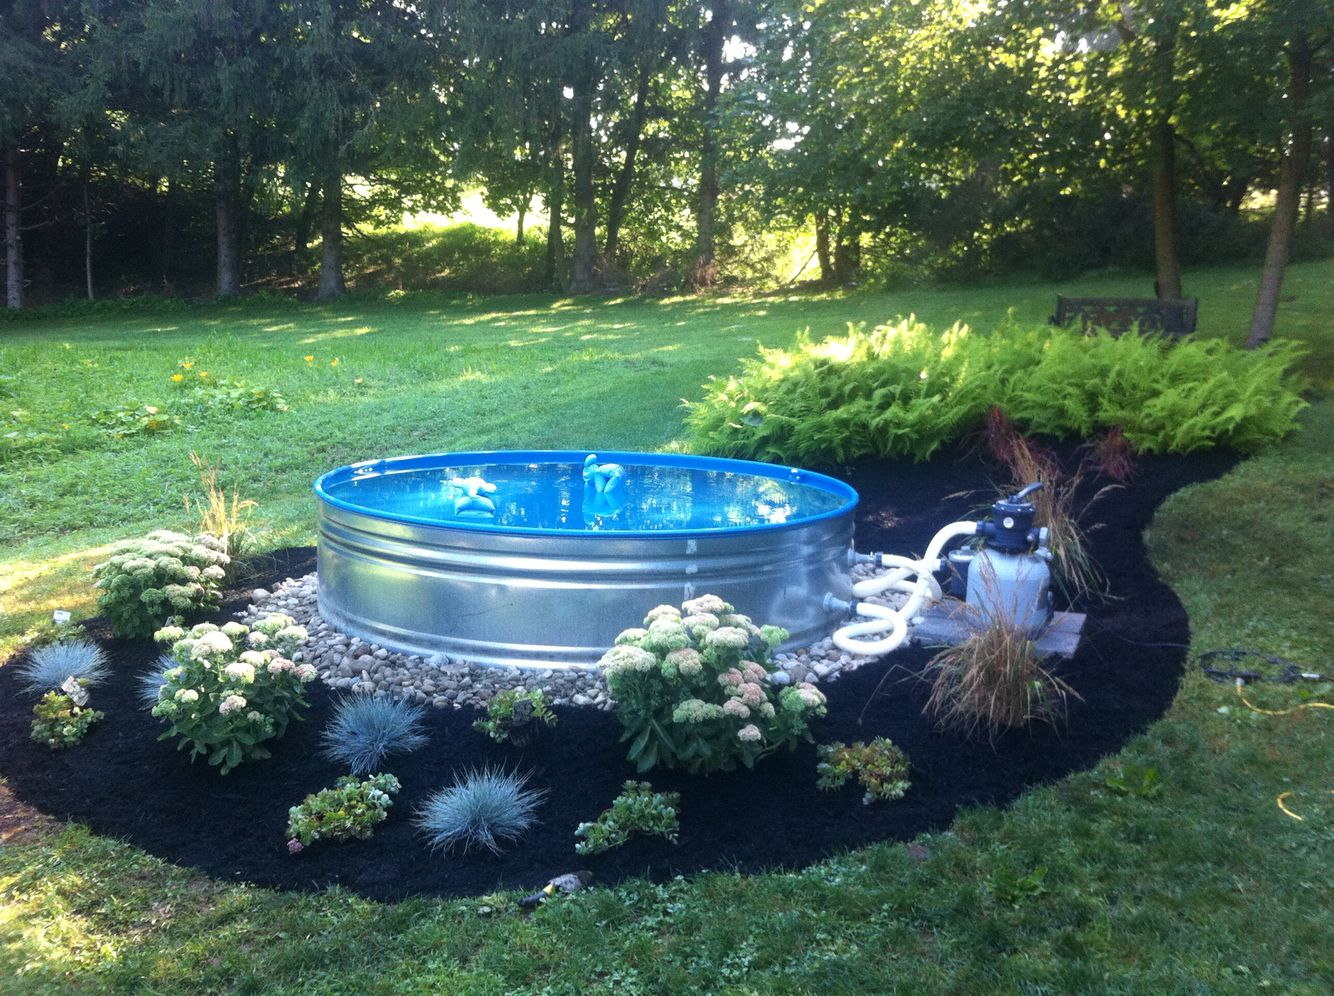 Galvanized steel stock tank mini pool | Galvanize steel ...